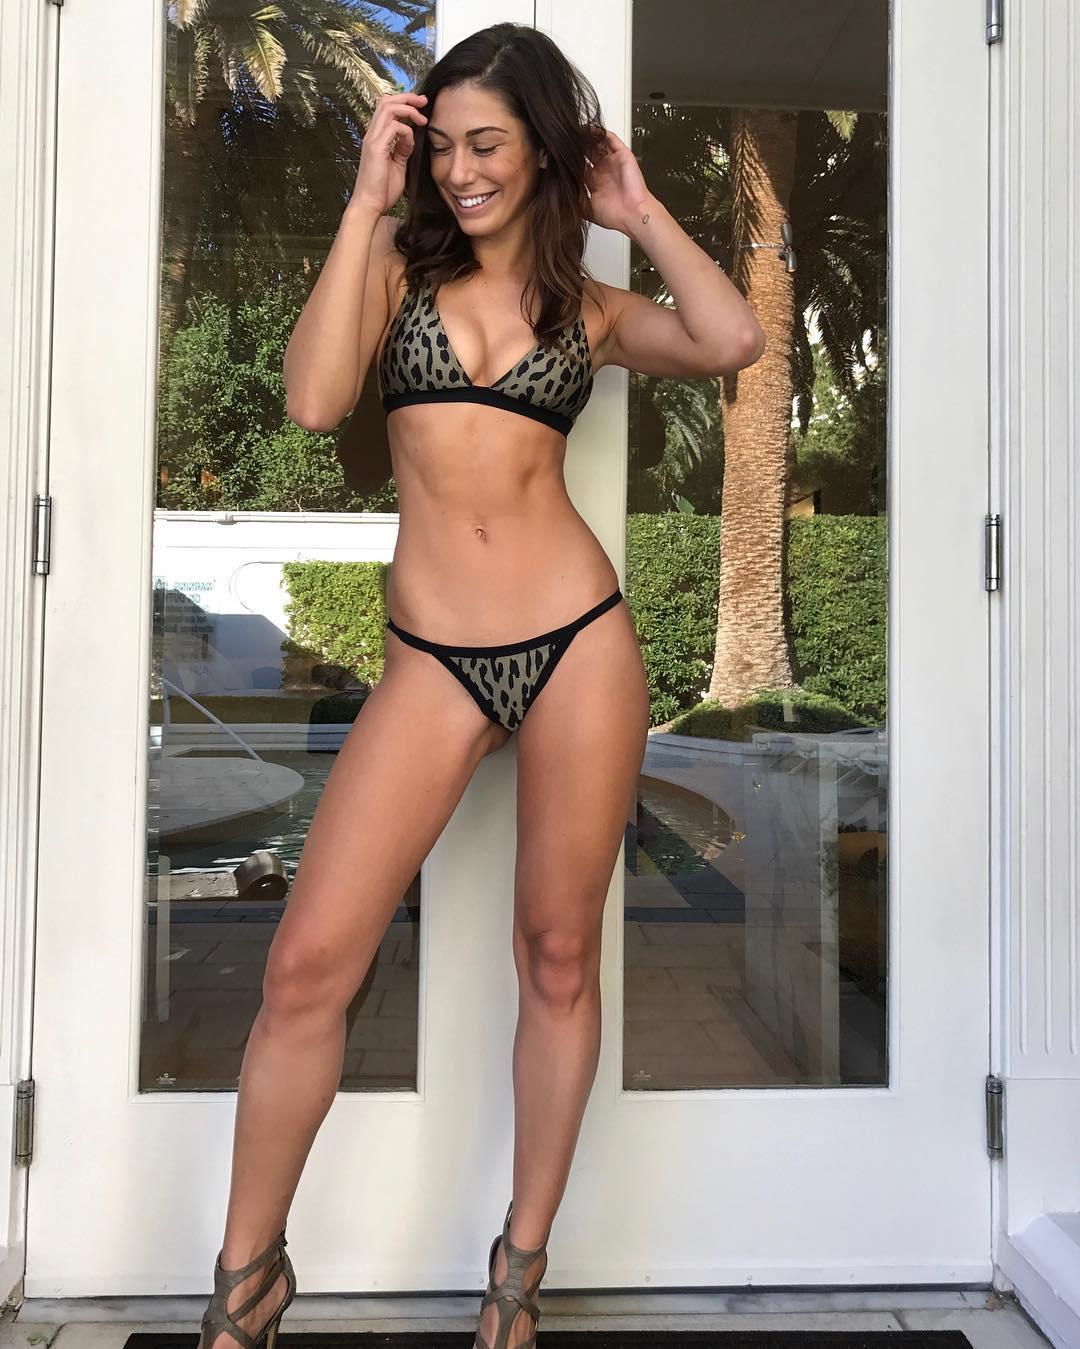 Hot Sydney Ladd naked (69 photos), Topless, Paparazzi, Selfie, in bikini 2006